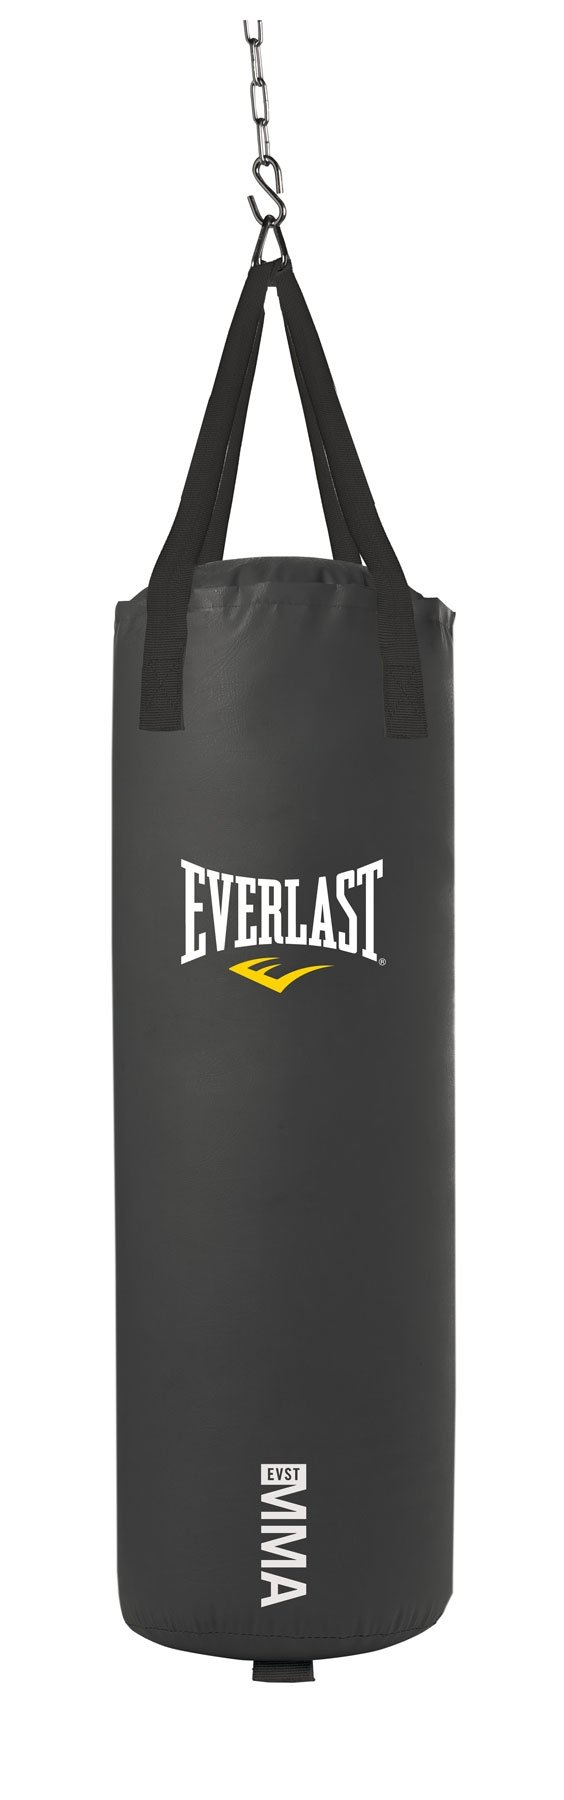 Everlast 70-Pound MMA Poly Canvas Heavy Bag (Black) by Everlast